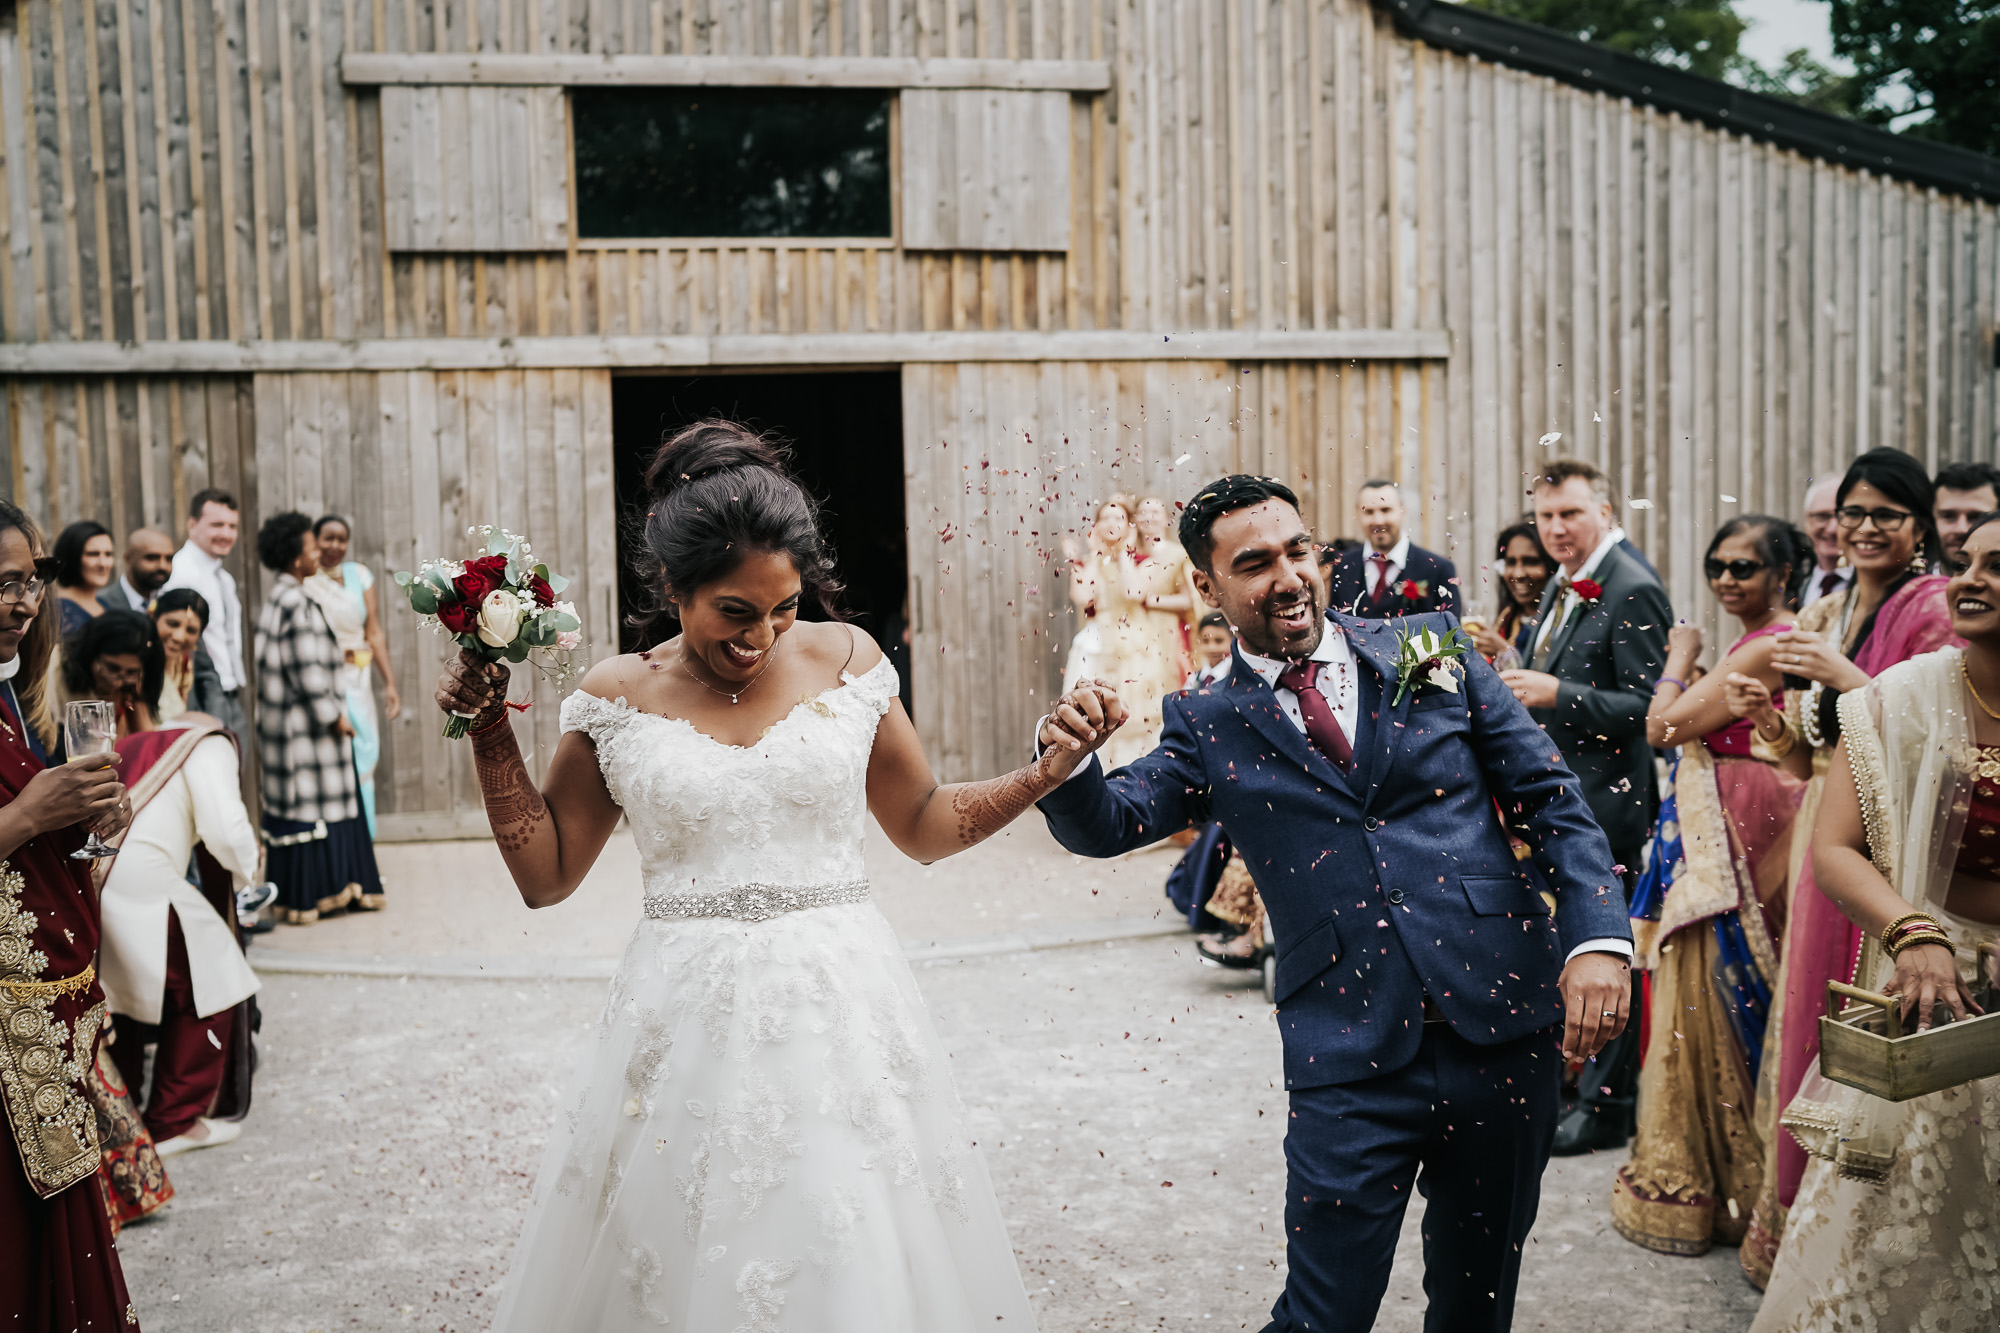 Alcumlow Hall Farm Indian Wedding Photographer (29 of 44).jpg